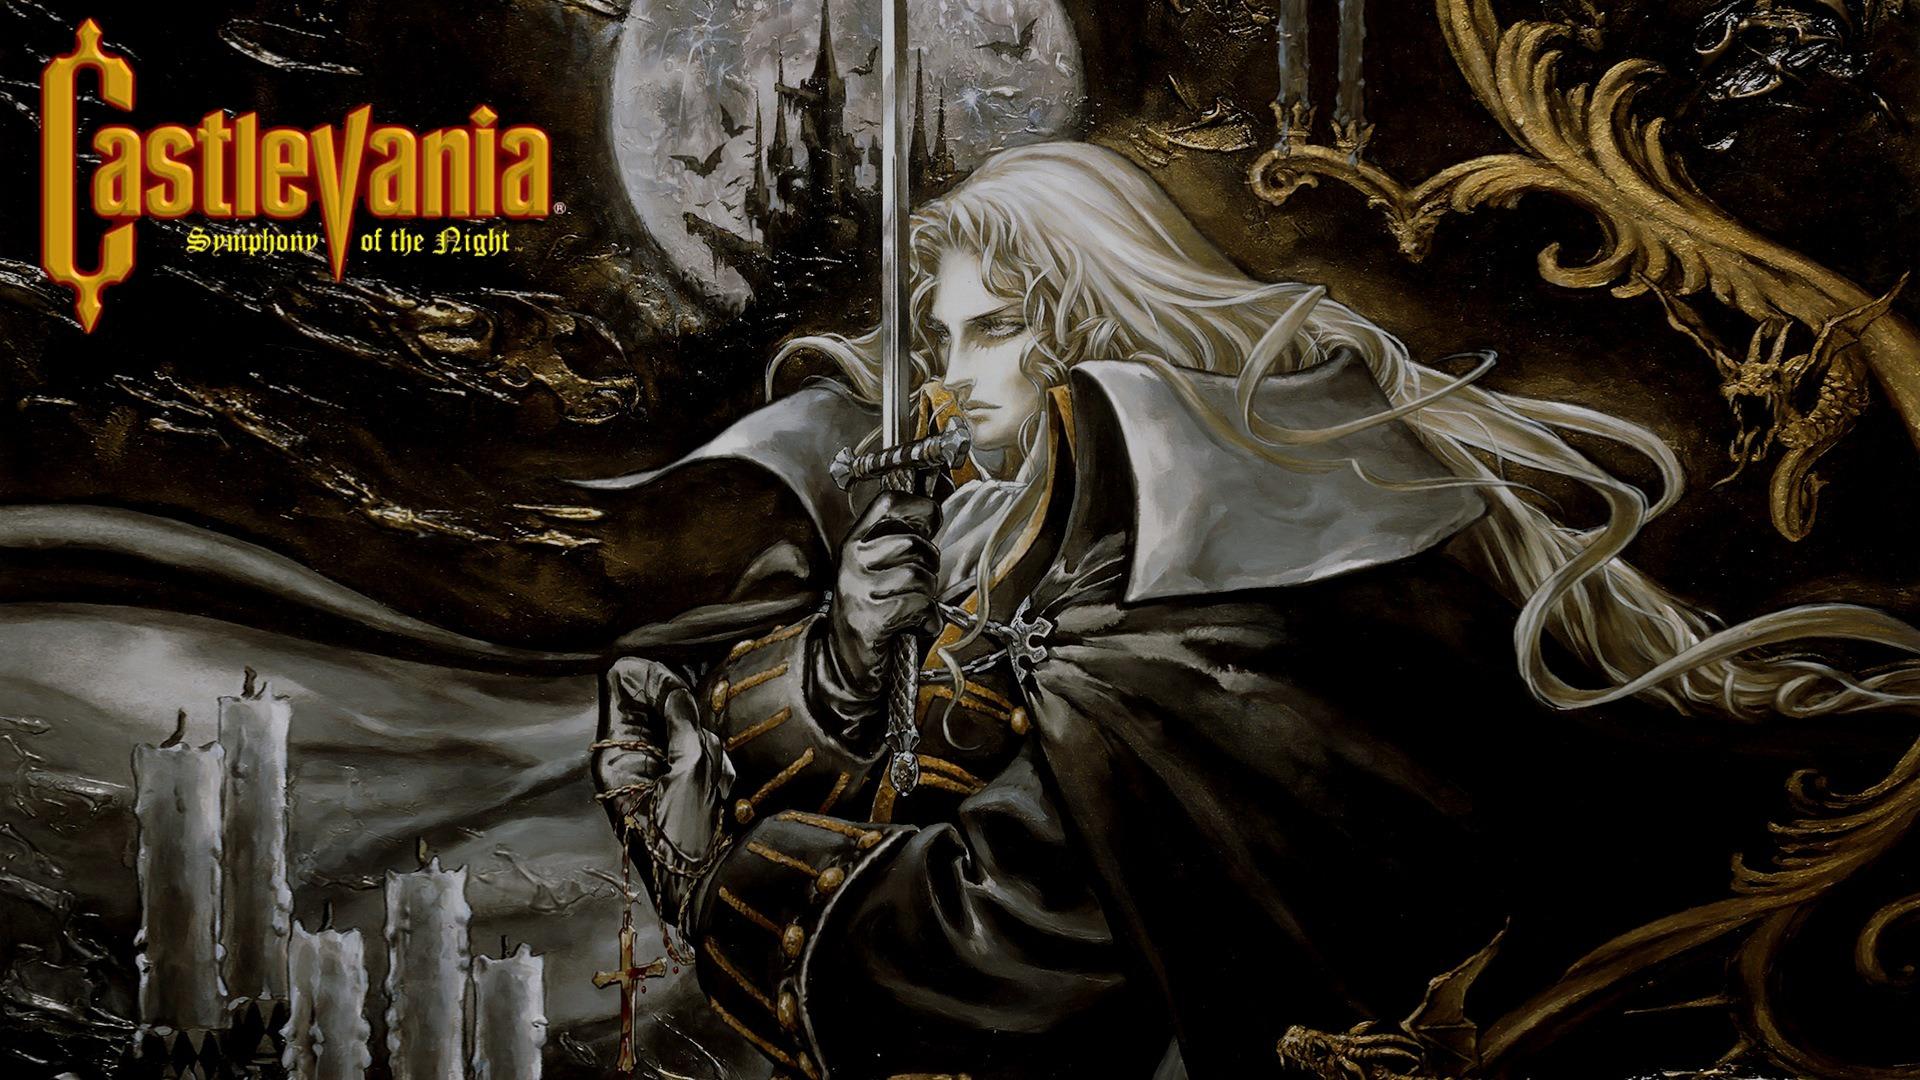 Castlevania Symphony of the Night: Celebrating 21 Years of Fright.